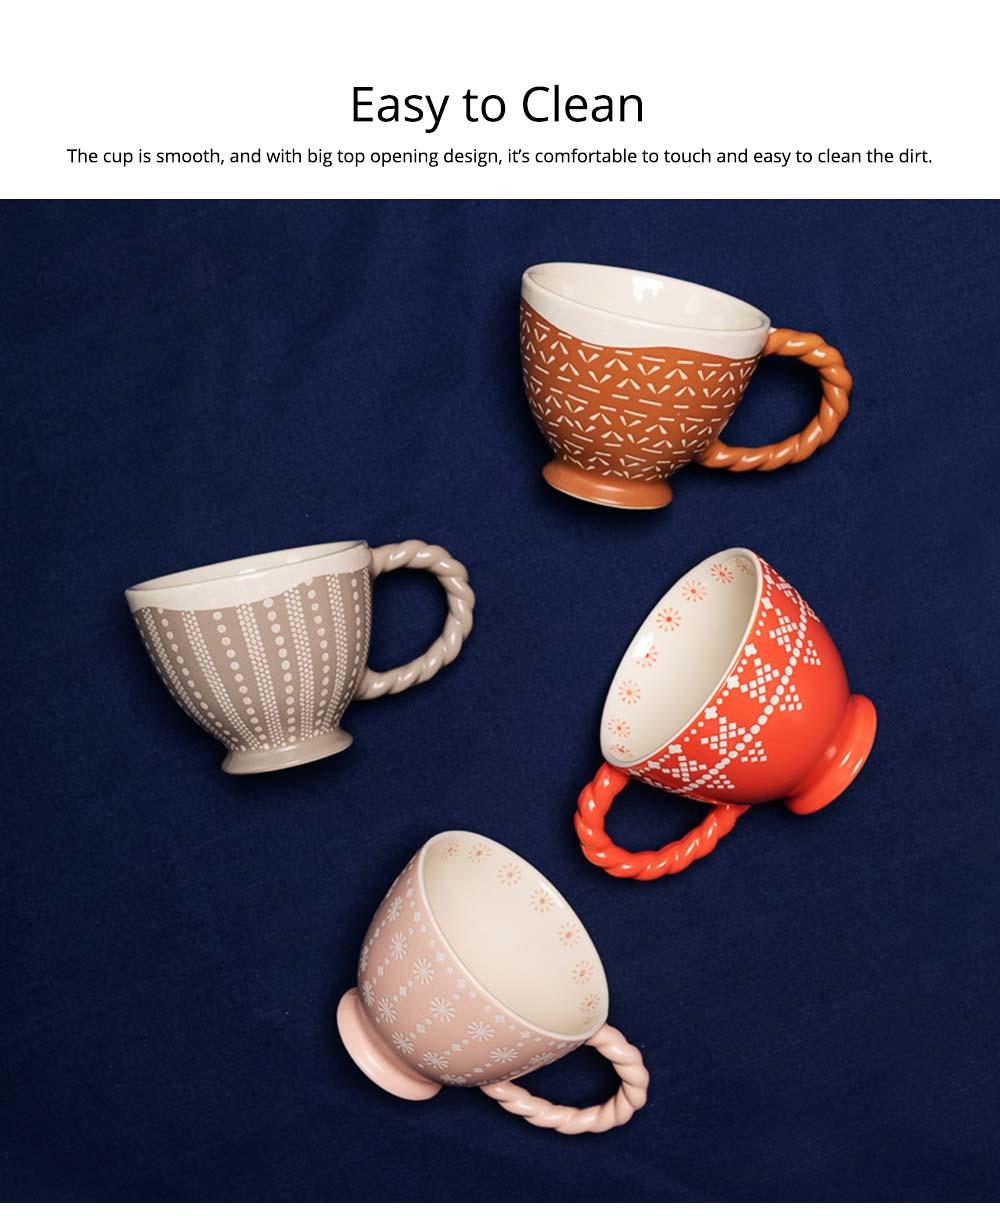 Ceramic Cup Breakfast Round Big Opening Mugs for Home Tea Milk Glazed white Porcelain Mug 4